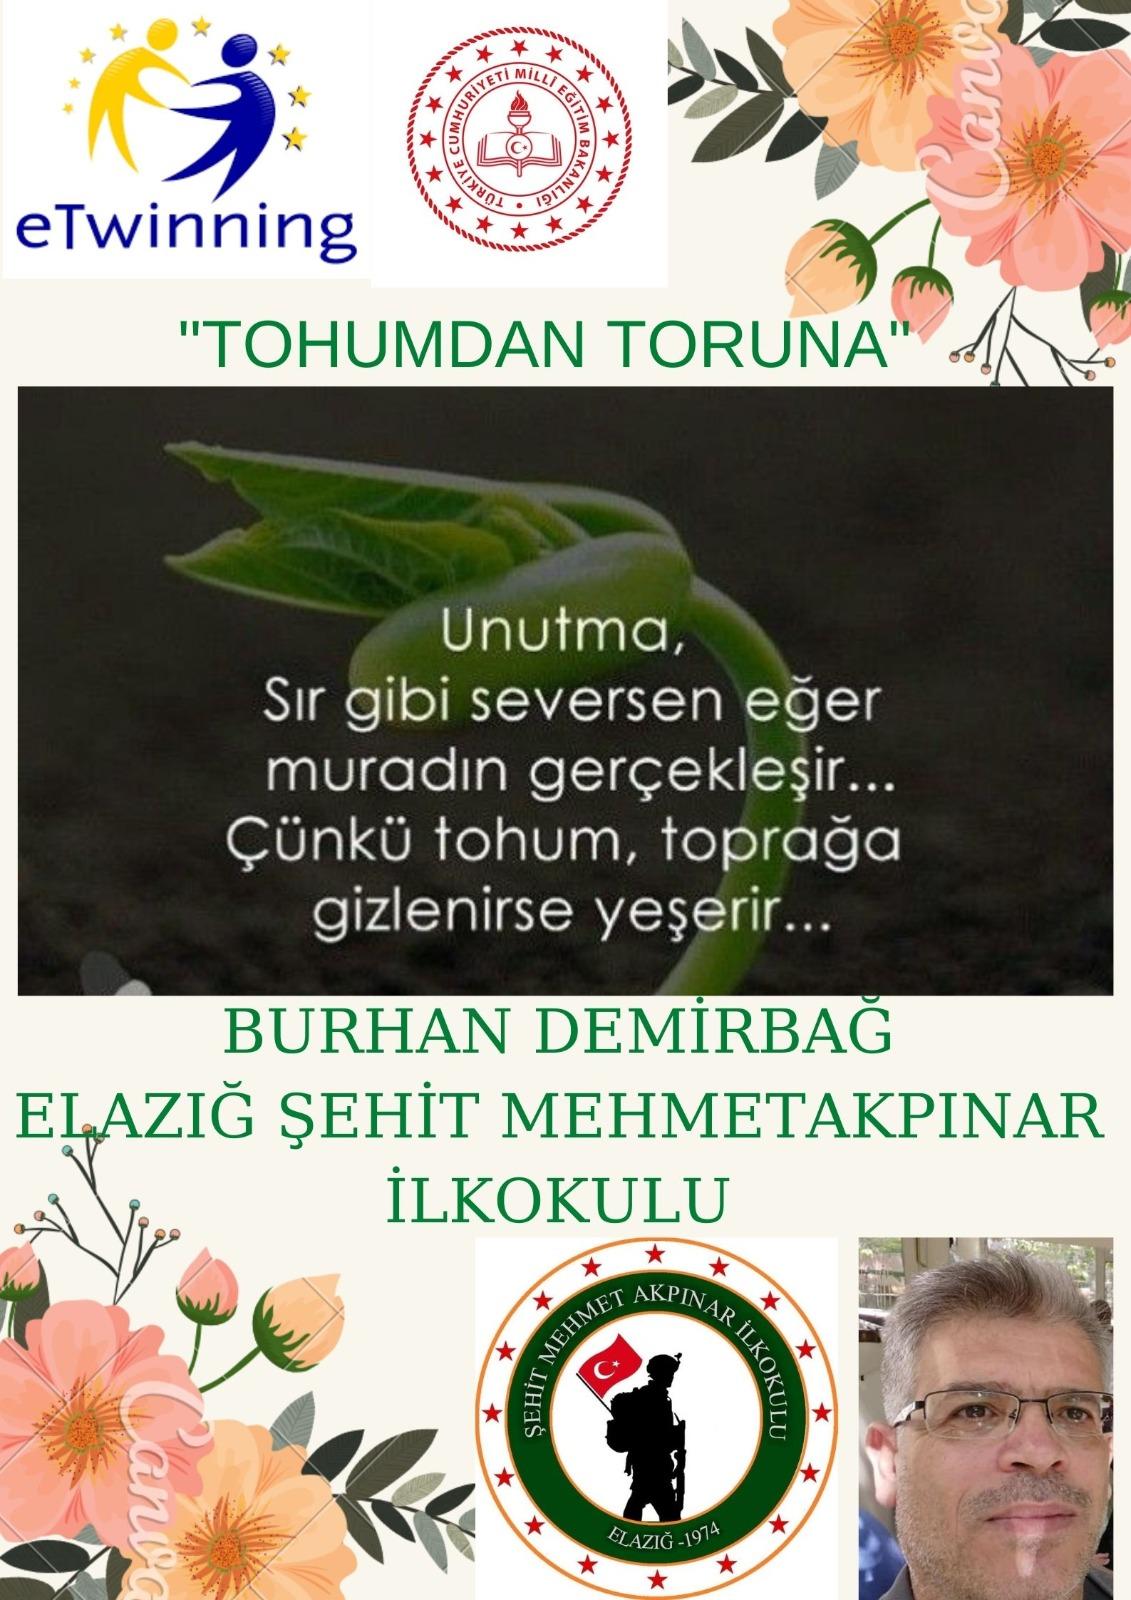 ELMA TOHUMUNUN MACERASI by Nursen Tos - Ourboox.com